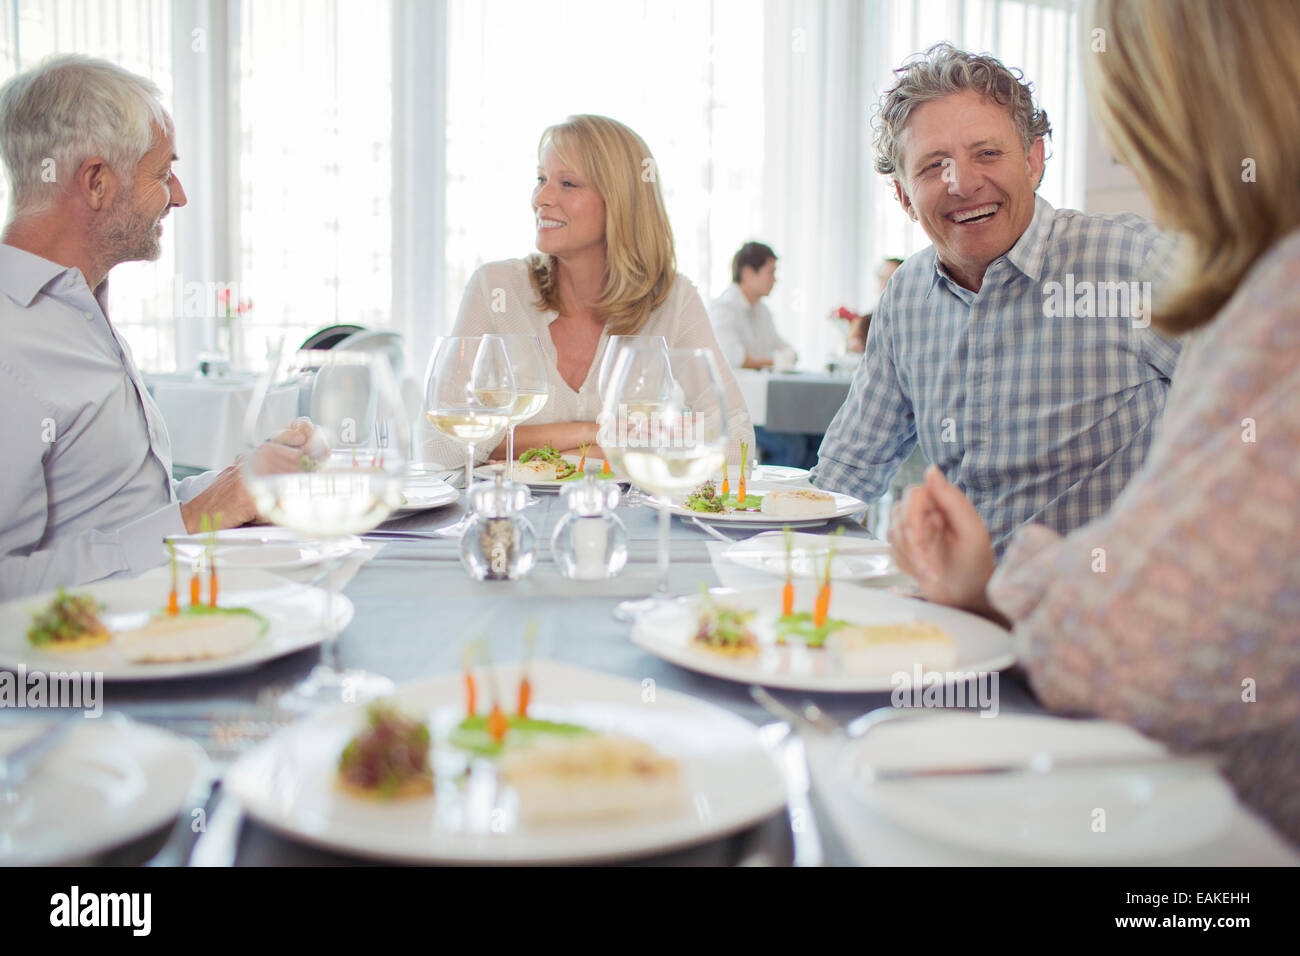 People Enjoying Fancy Meal In Restaurant Stock Photo Alamy